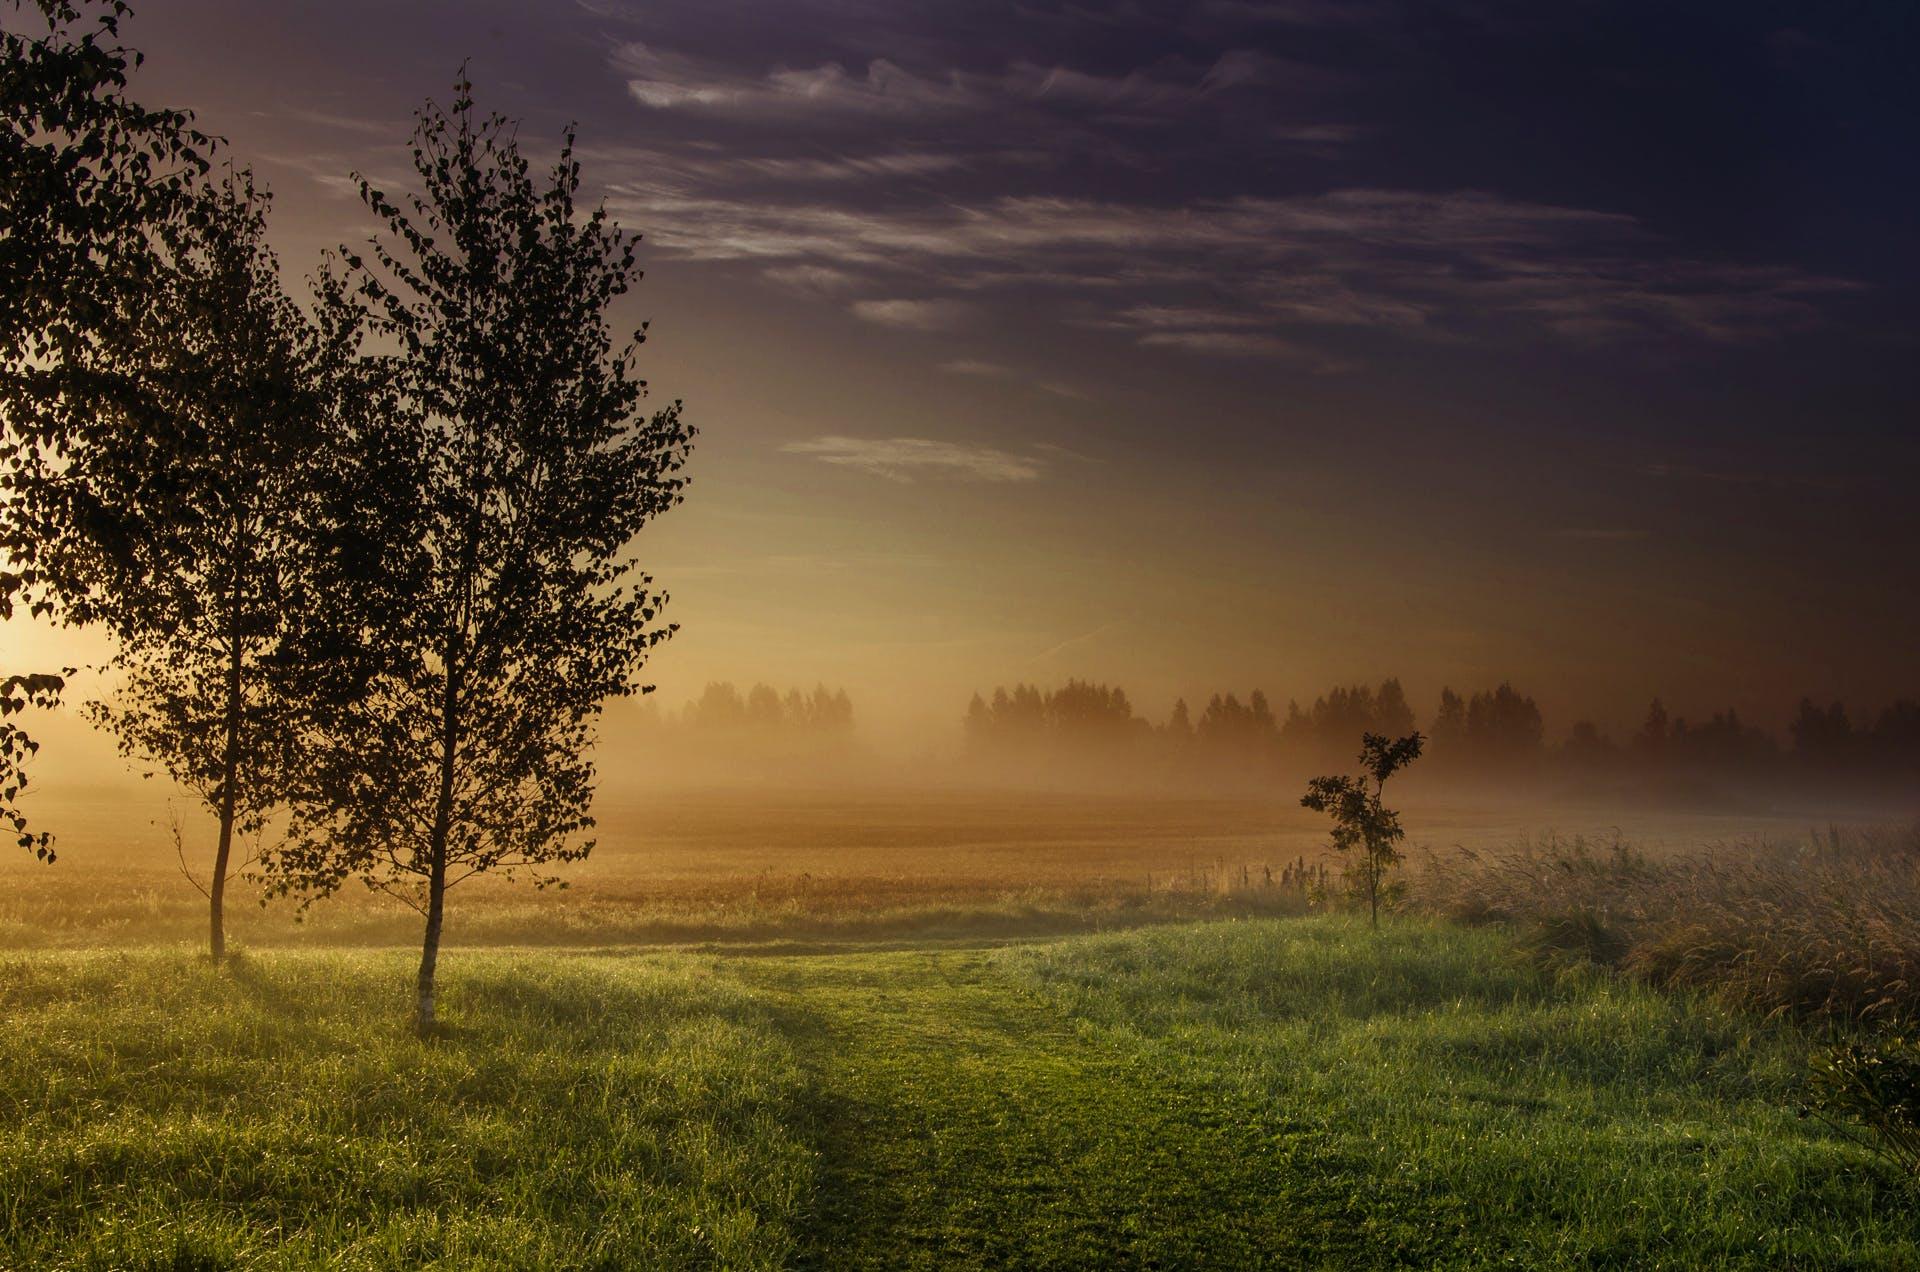 Landscape Photography Green Grass-field Beside Dark Foggy Forest during Golden Hour